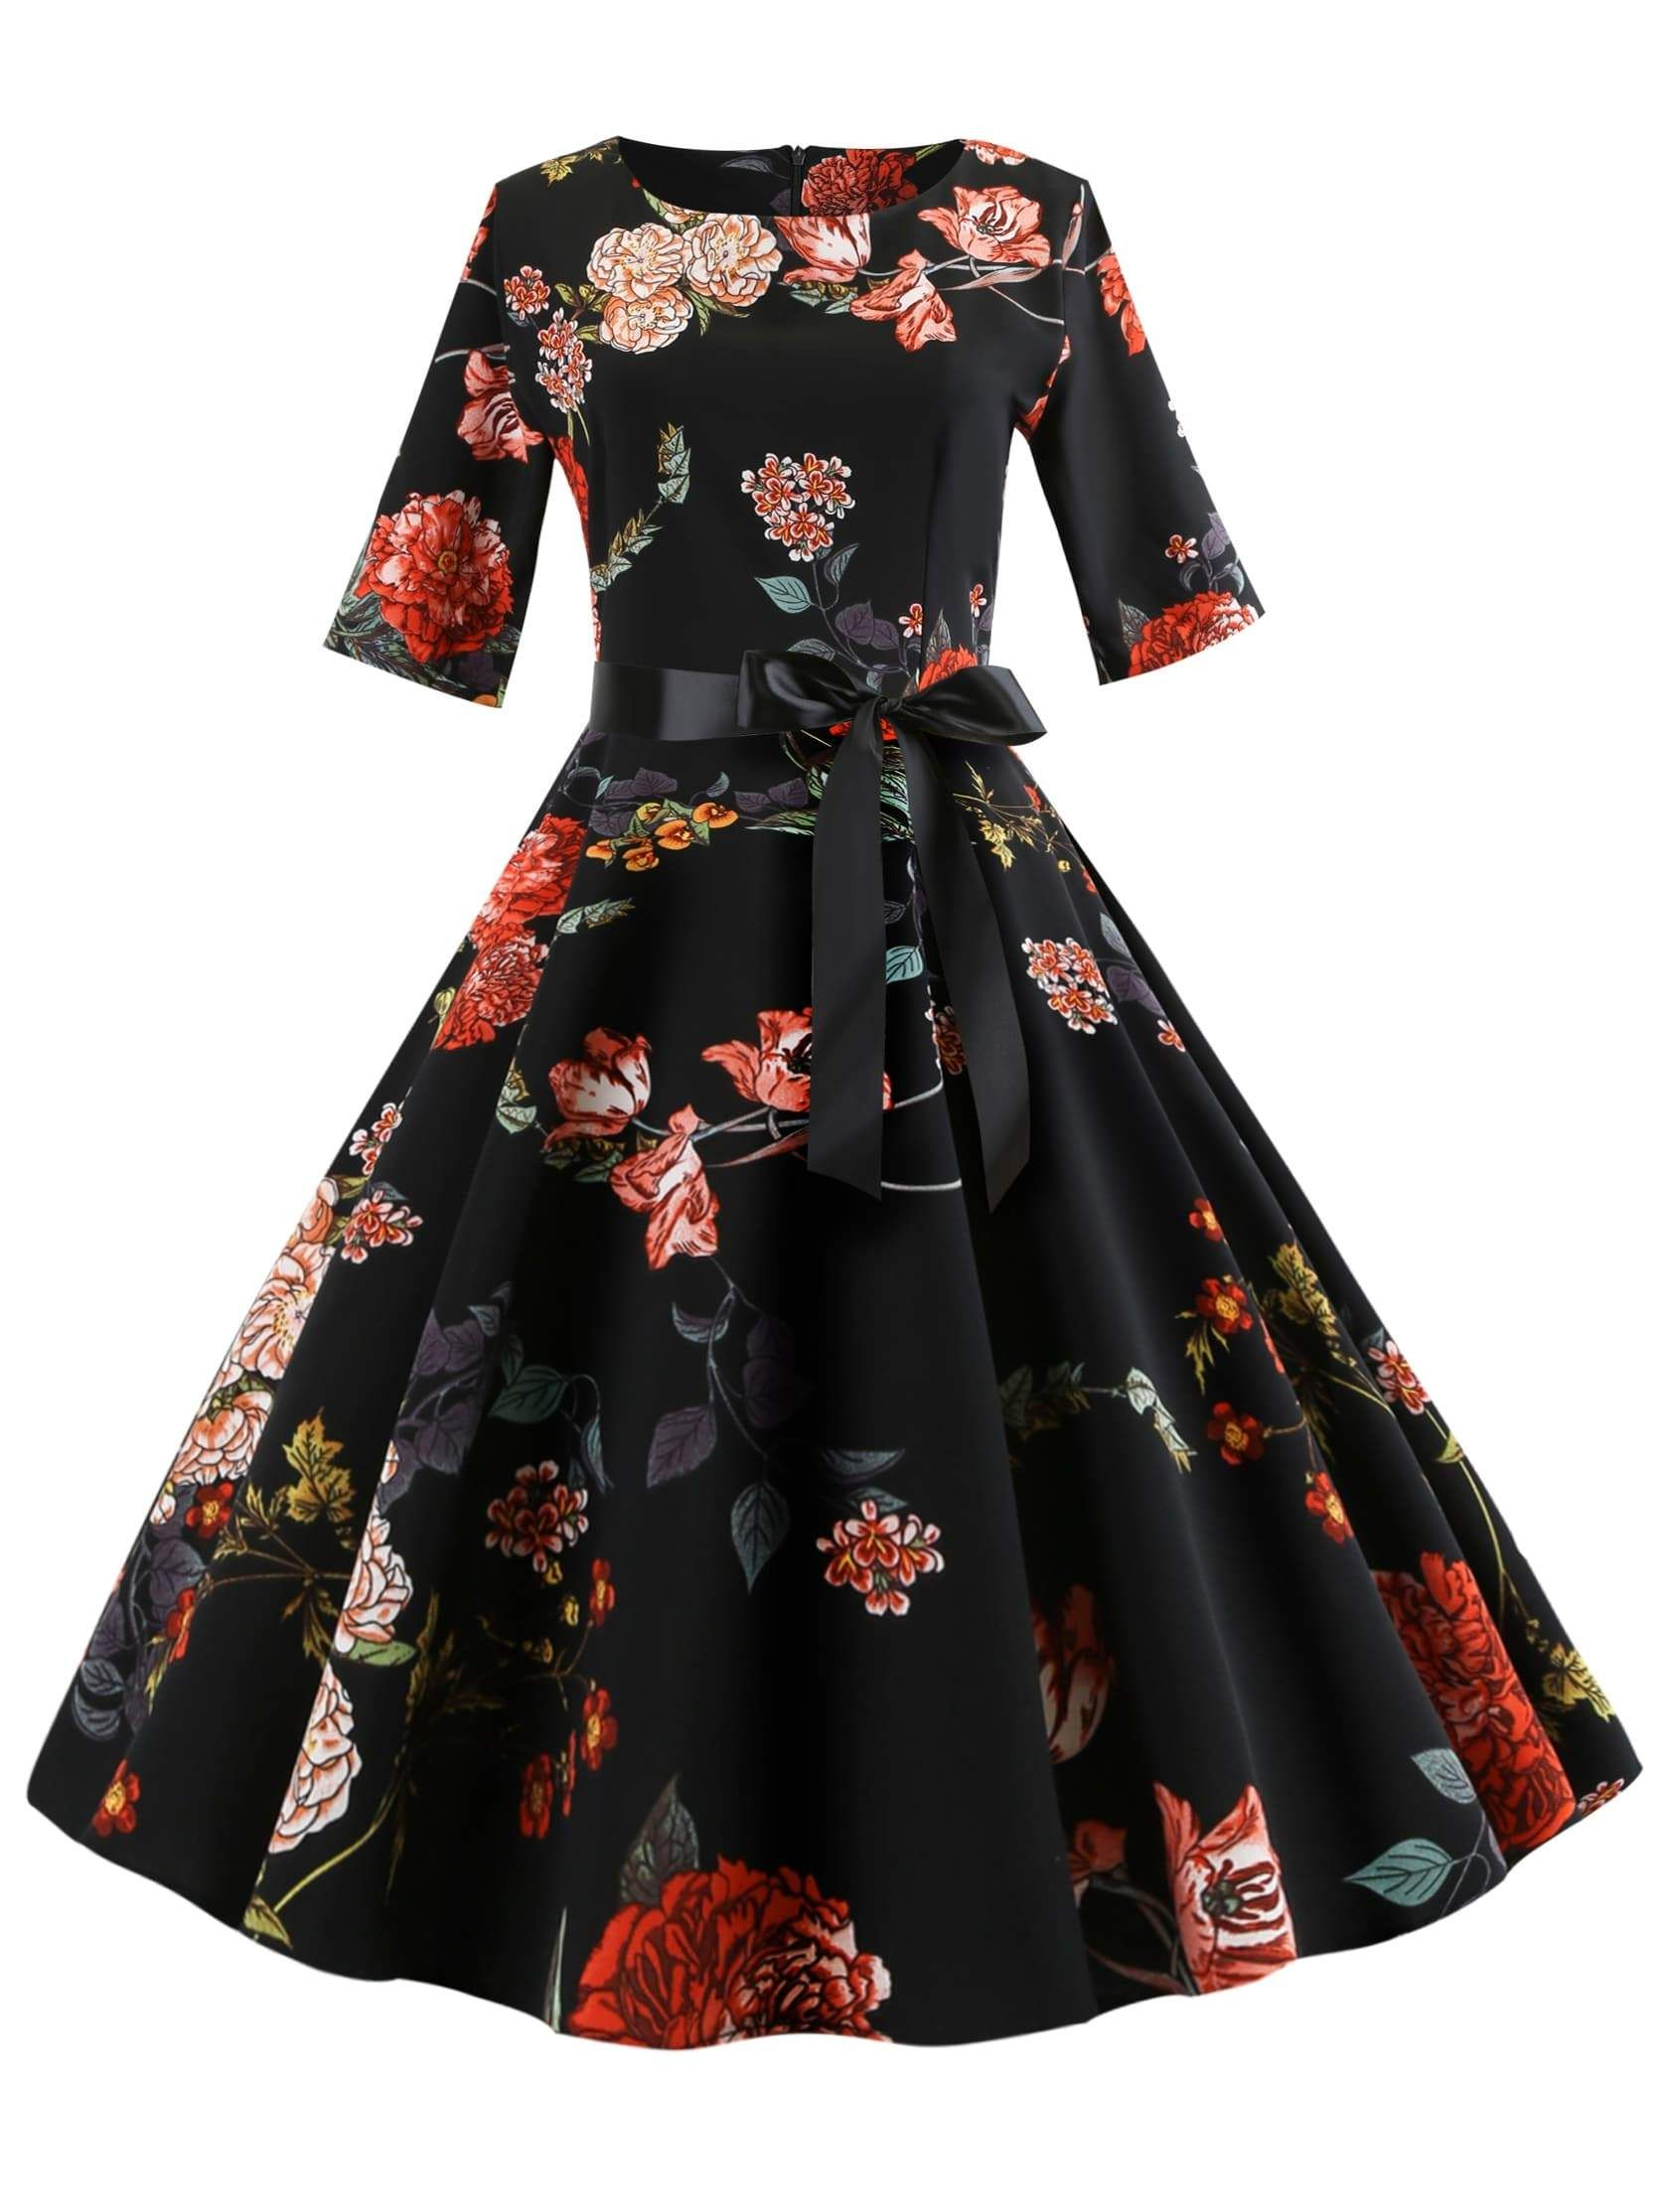 Azulina Audrey Hepburn Vintage Party Dress Women Floral Flare Midi Dresses  Winter Autumn Retro Elegant Dress Vestidos Robe Femme  d6d2688e6260